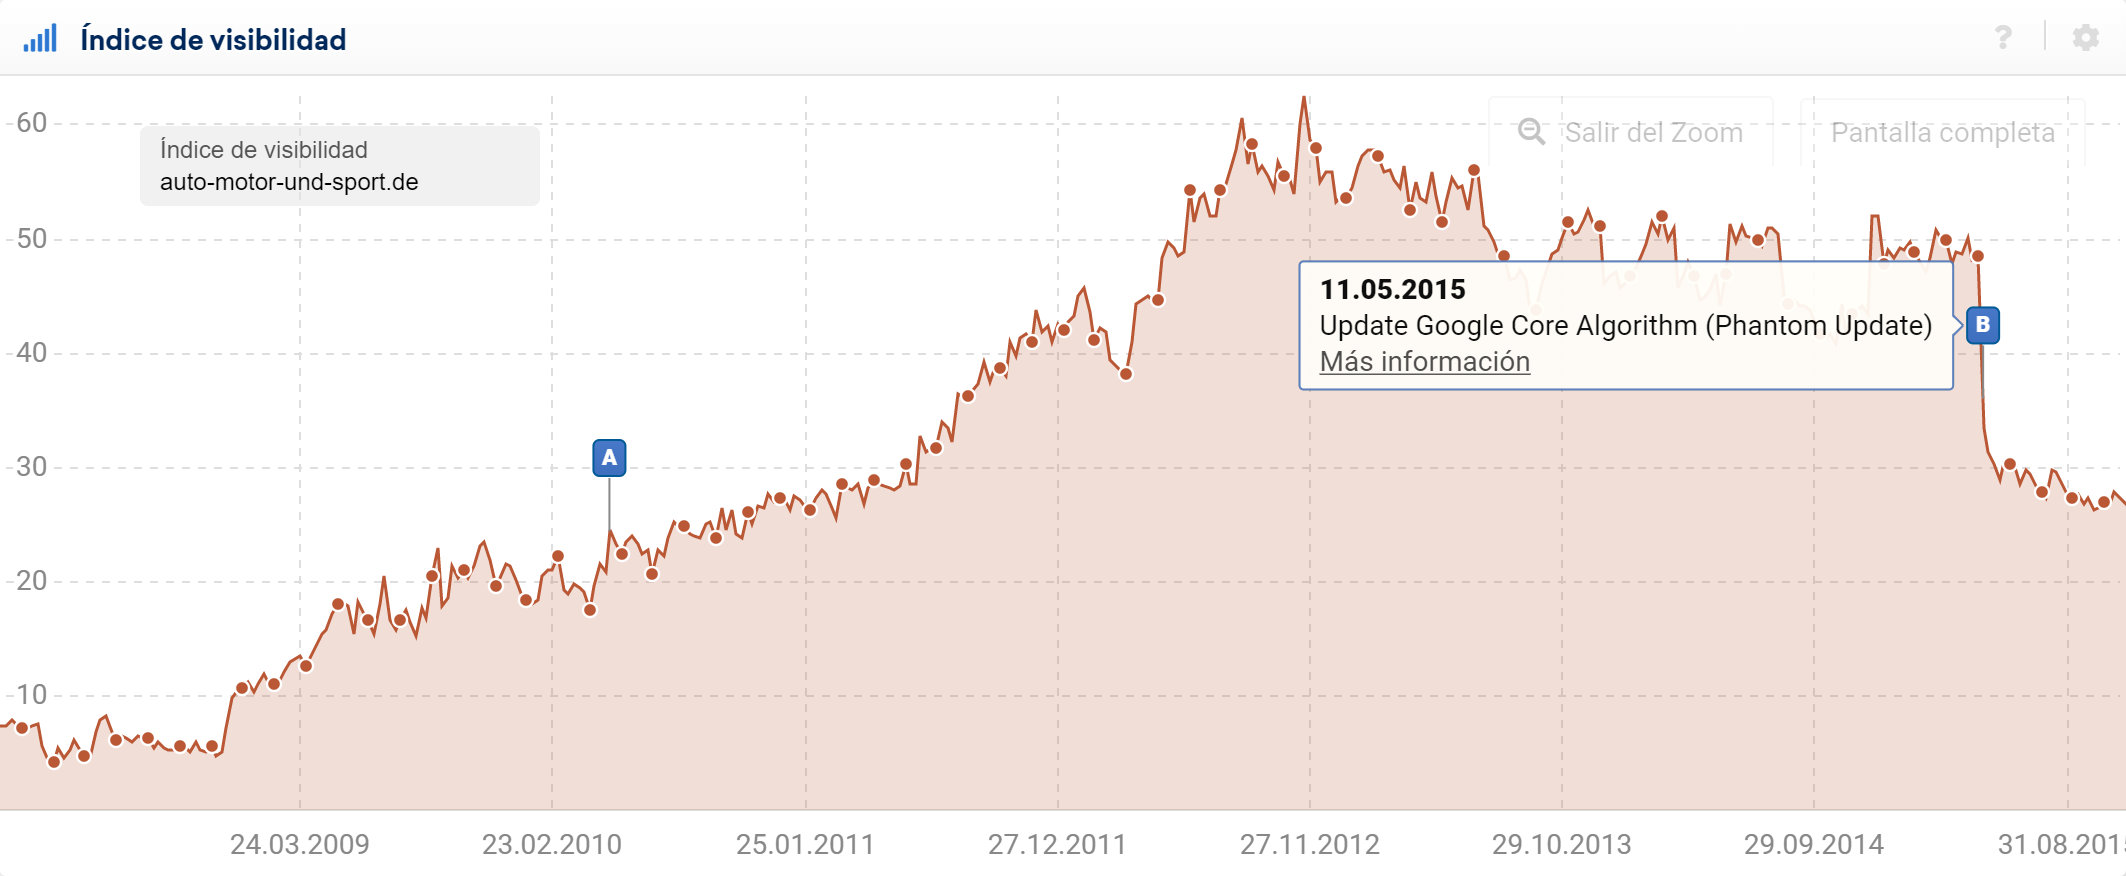 The domain auto-motor-und-sport.de was hit by Google's Core Algorithm Update.